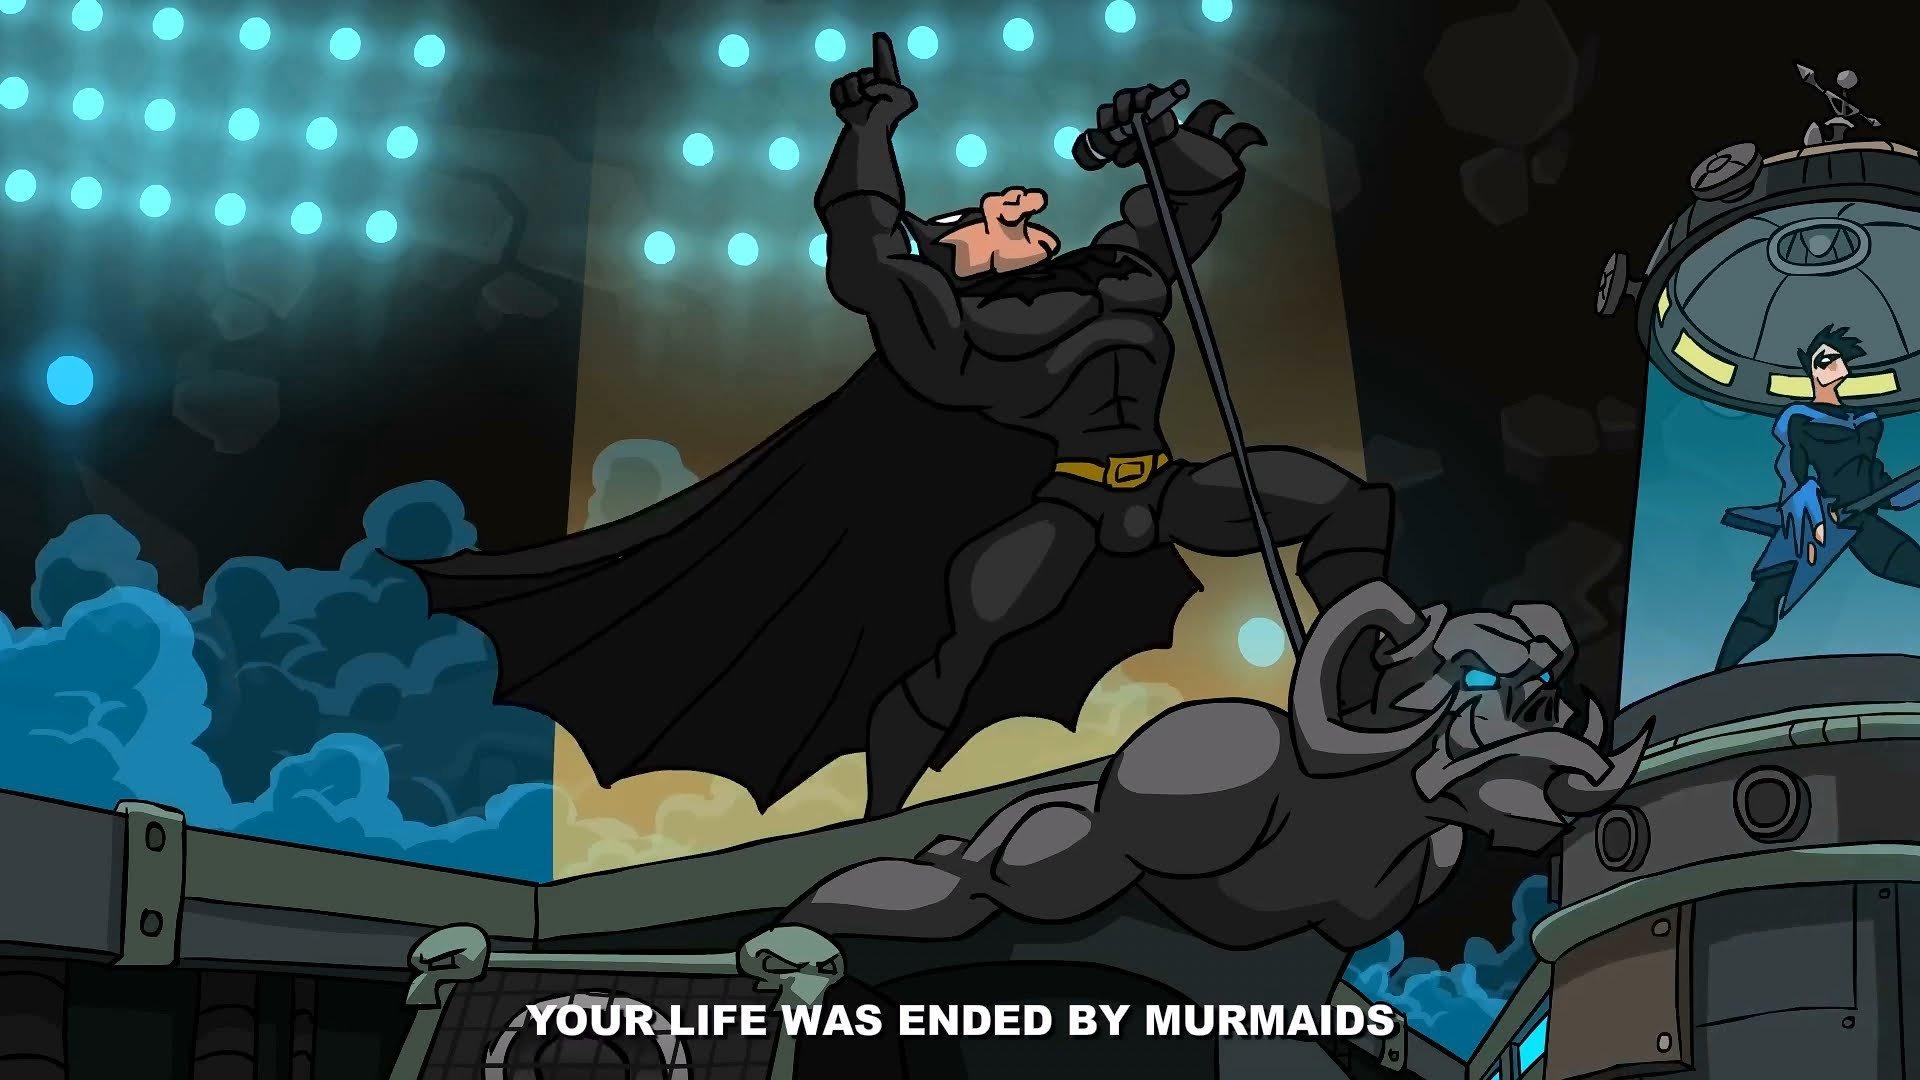 Batmetal | Know Your Meme